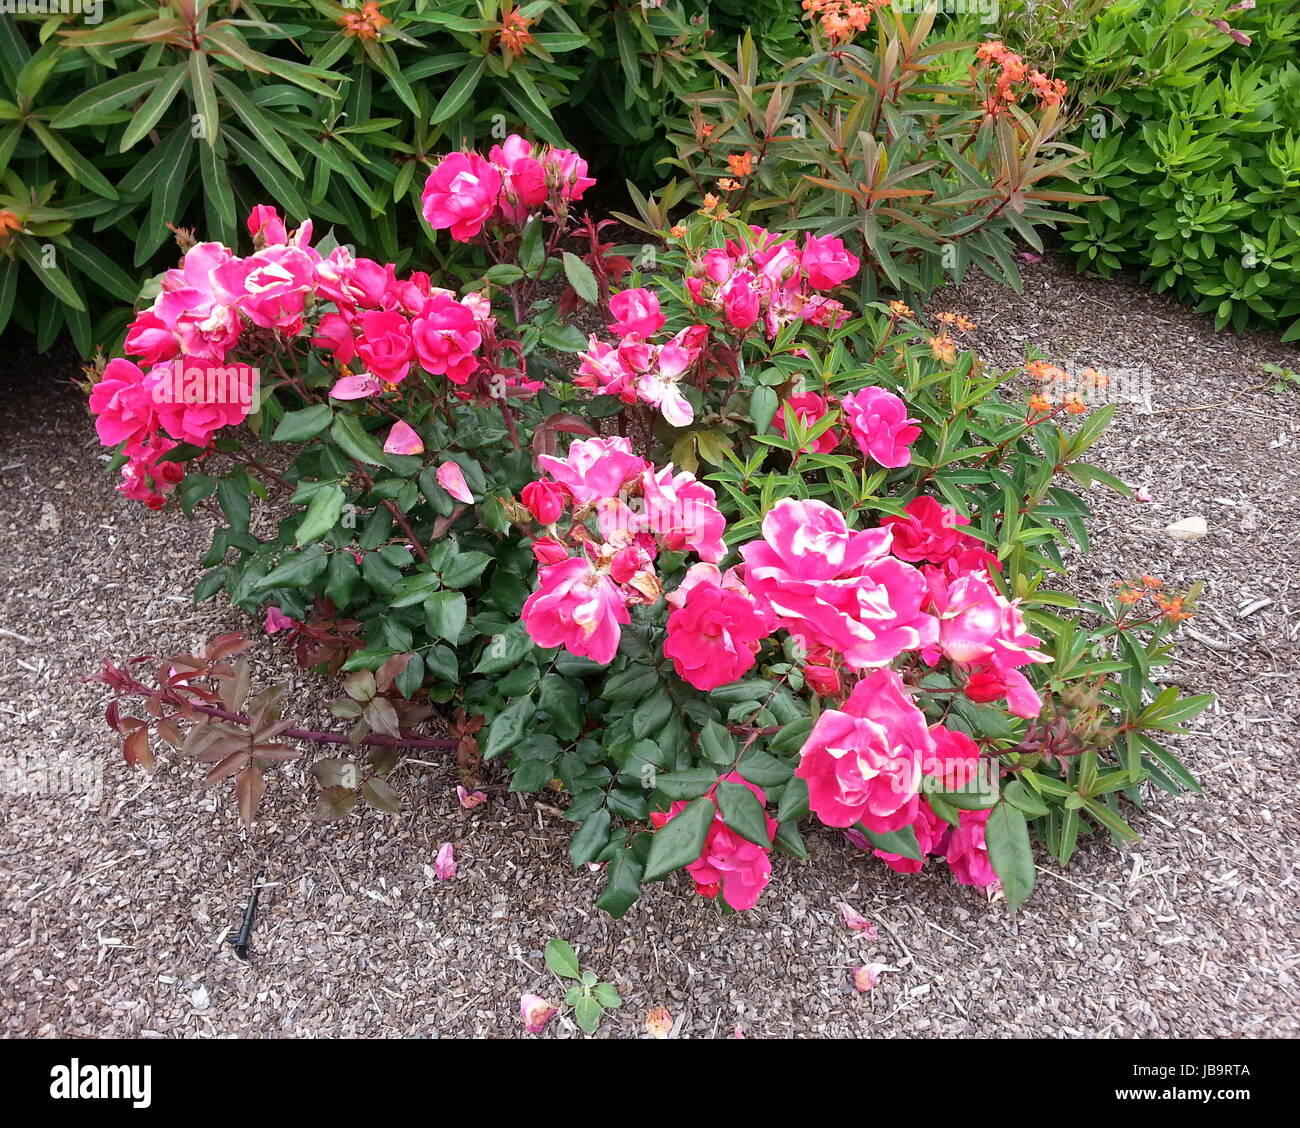 Bright Pink Rose Bush Stock Photos Bright Pink Rose Bush Stock